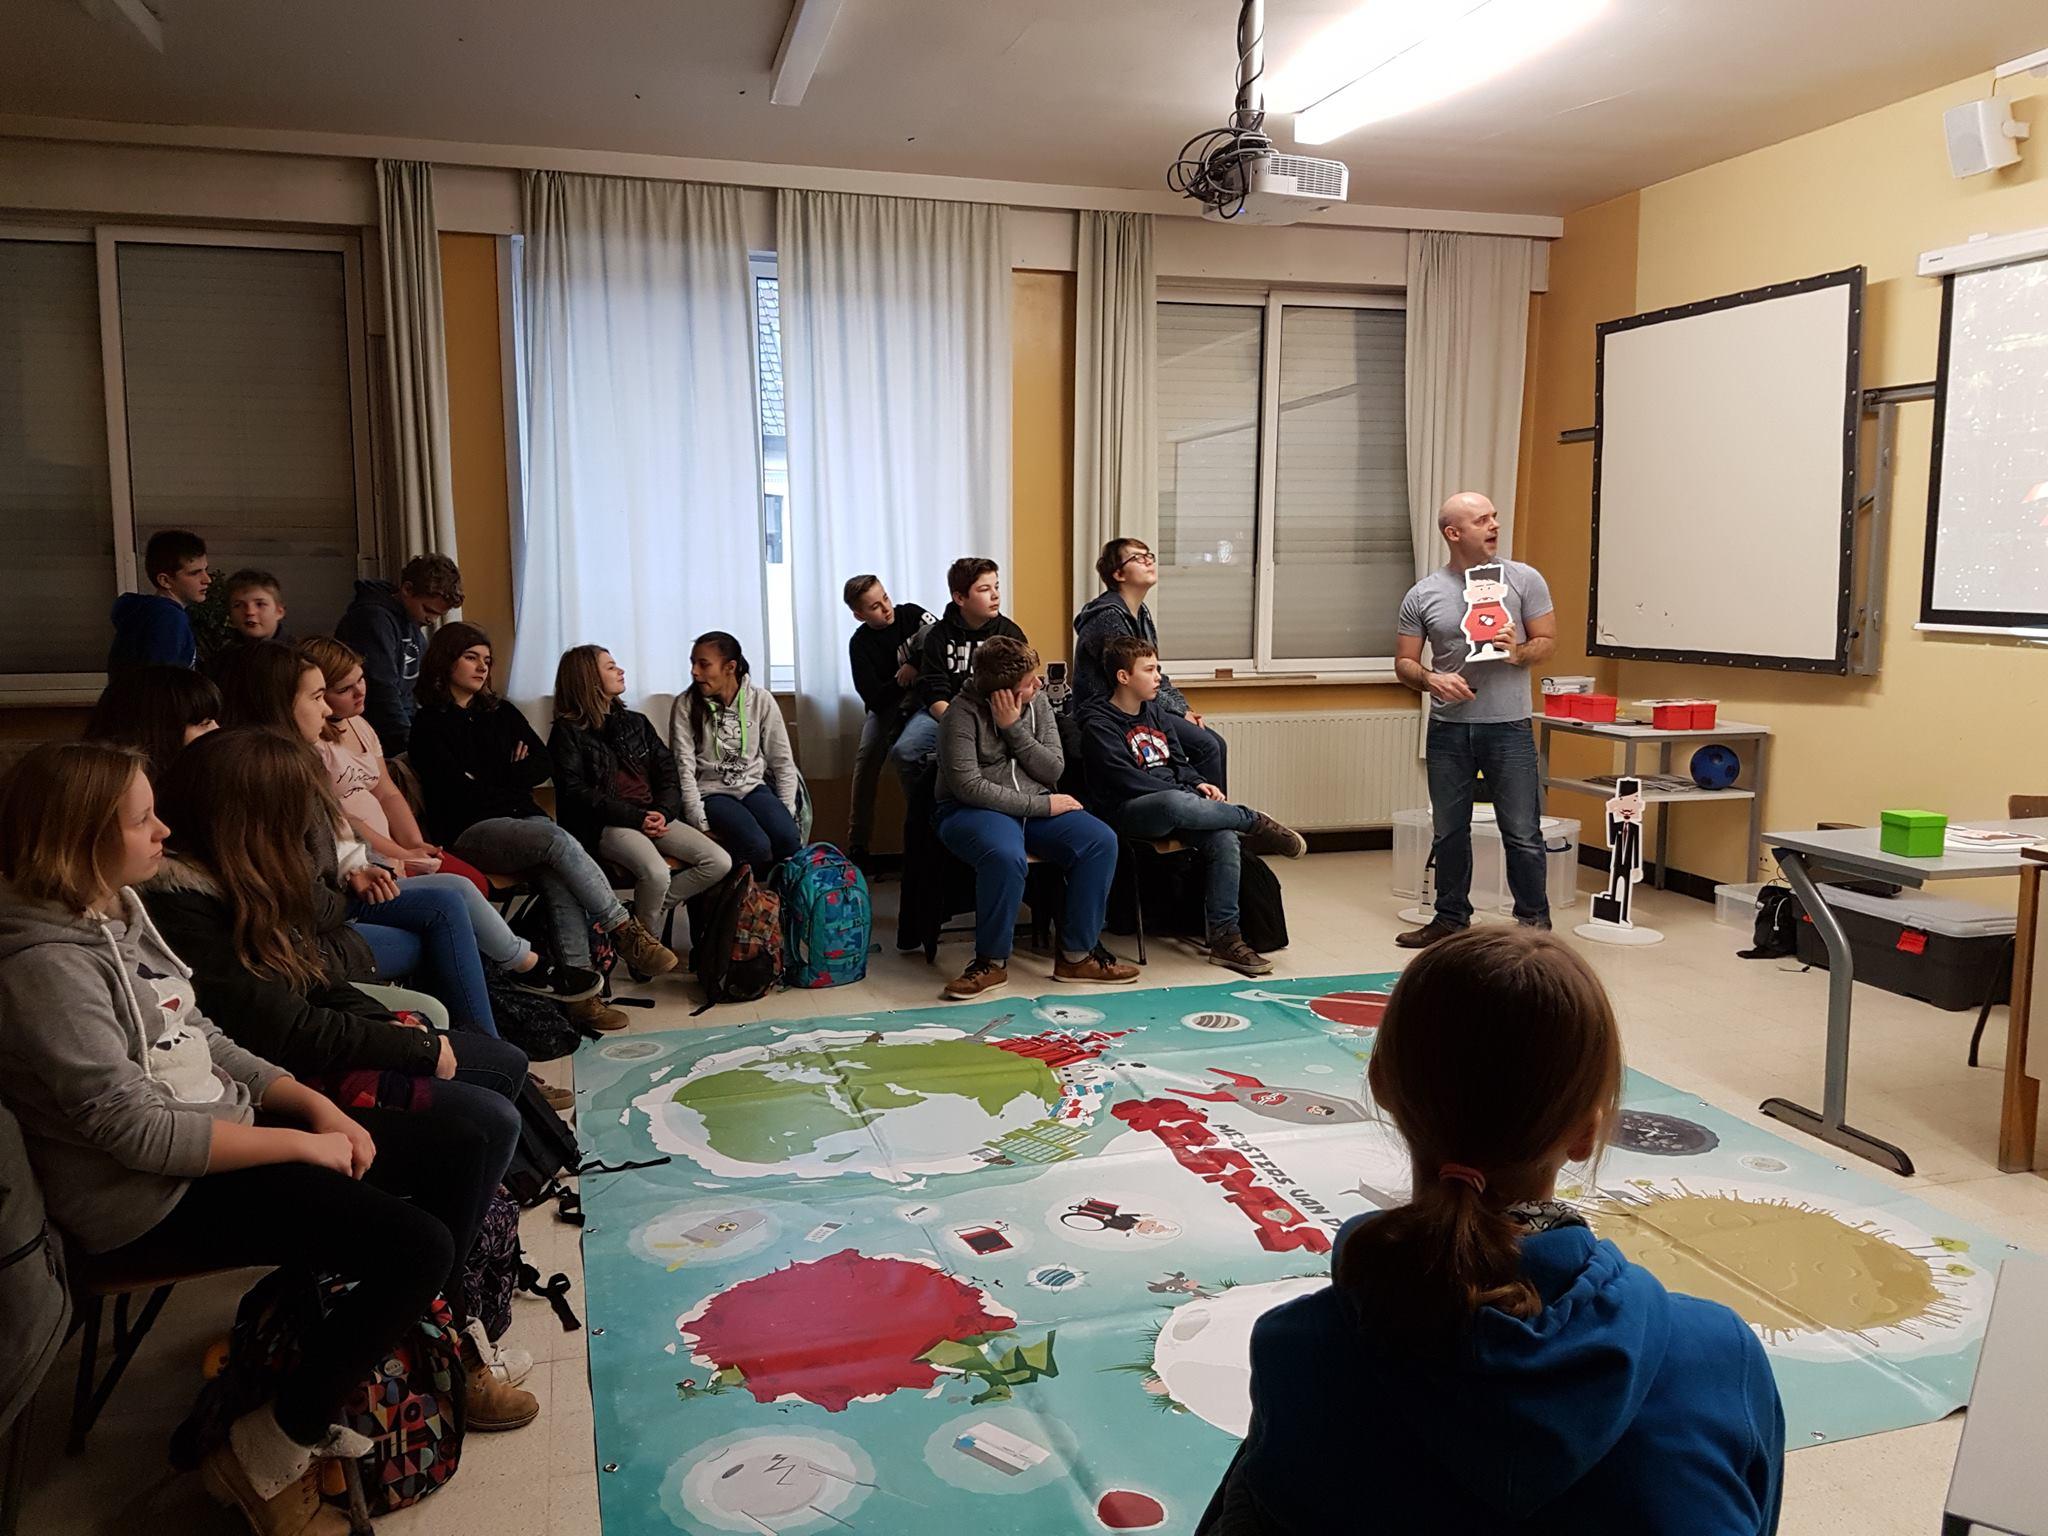 Secundair onderwijs Vabi Roeselare